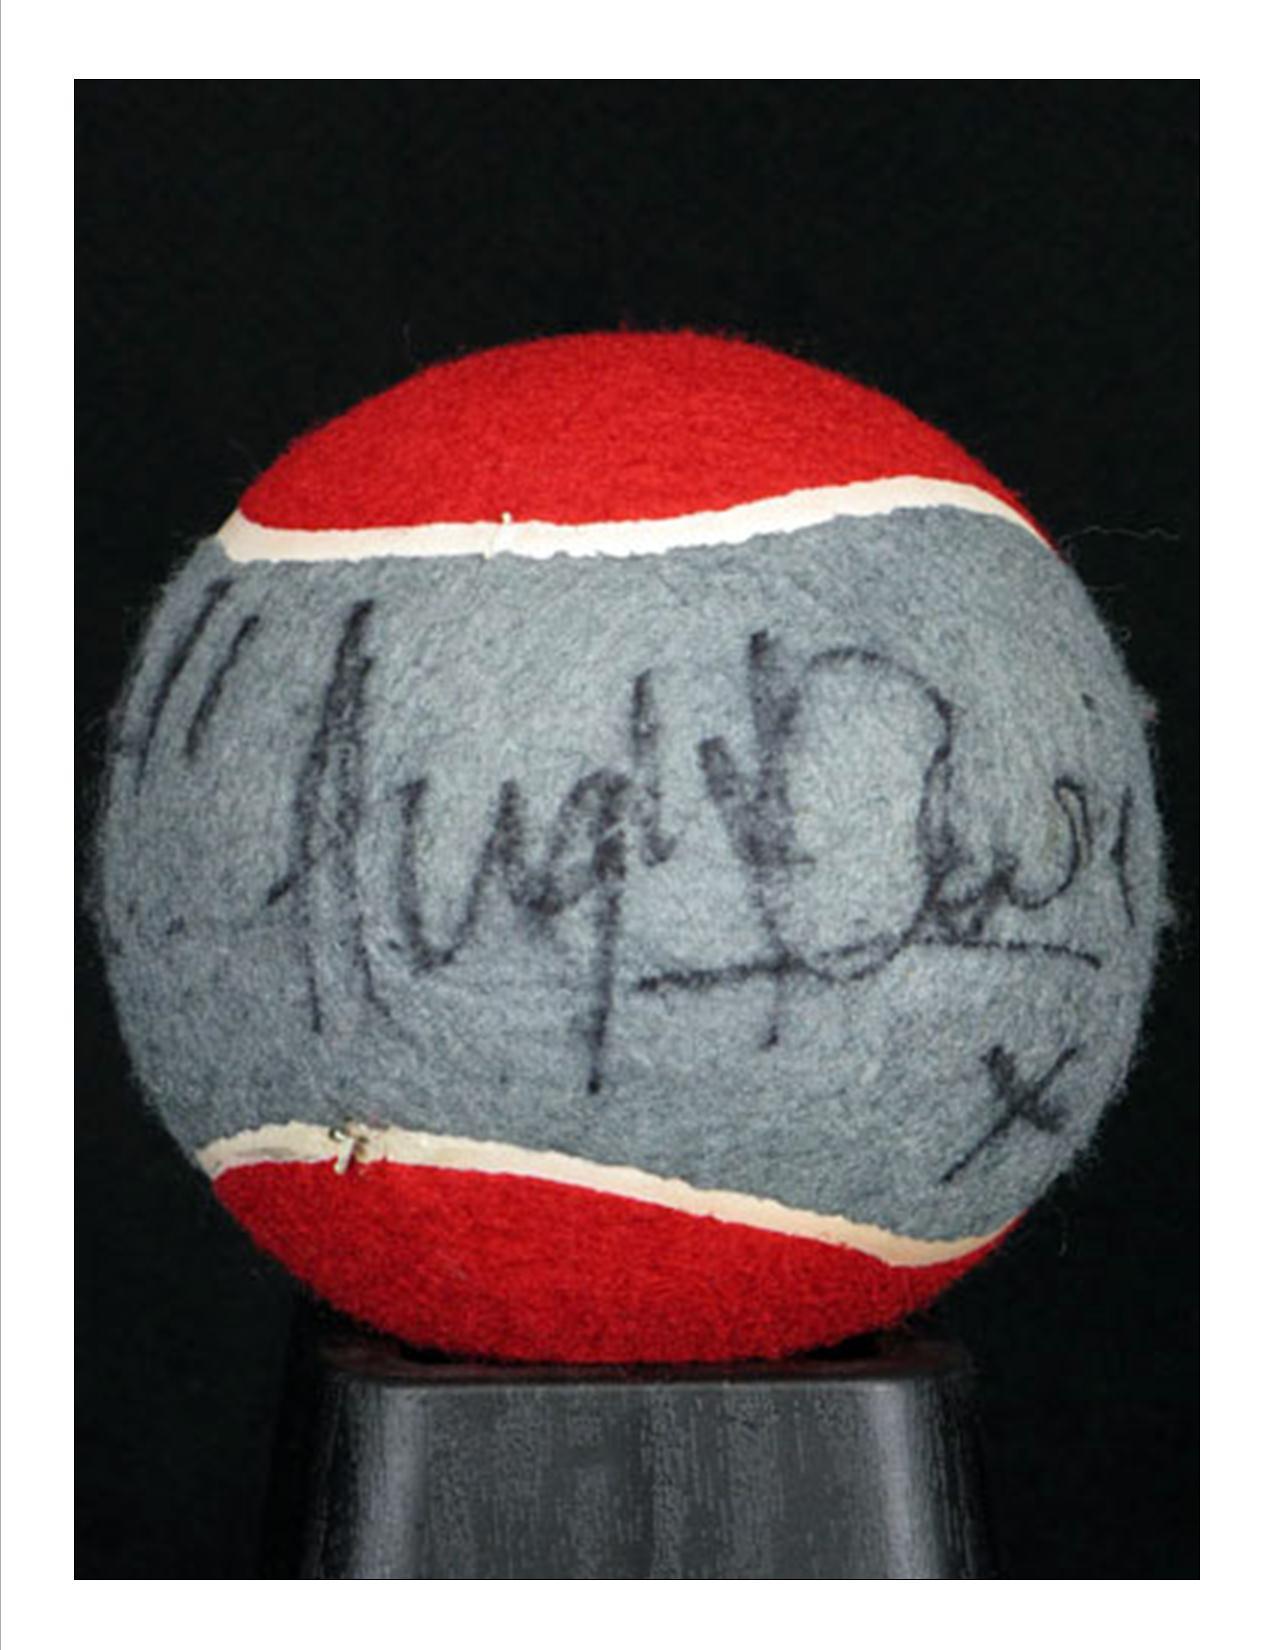 Hugh autographs House Tennis ball